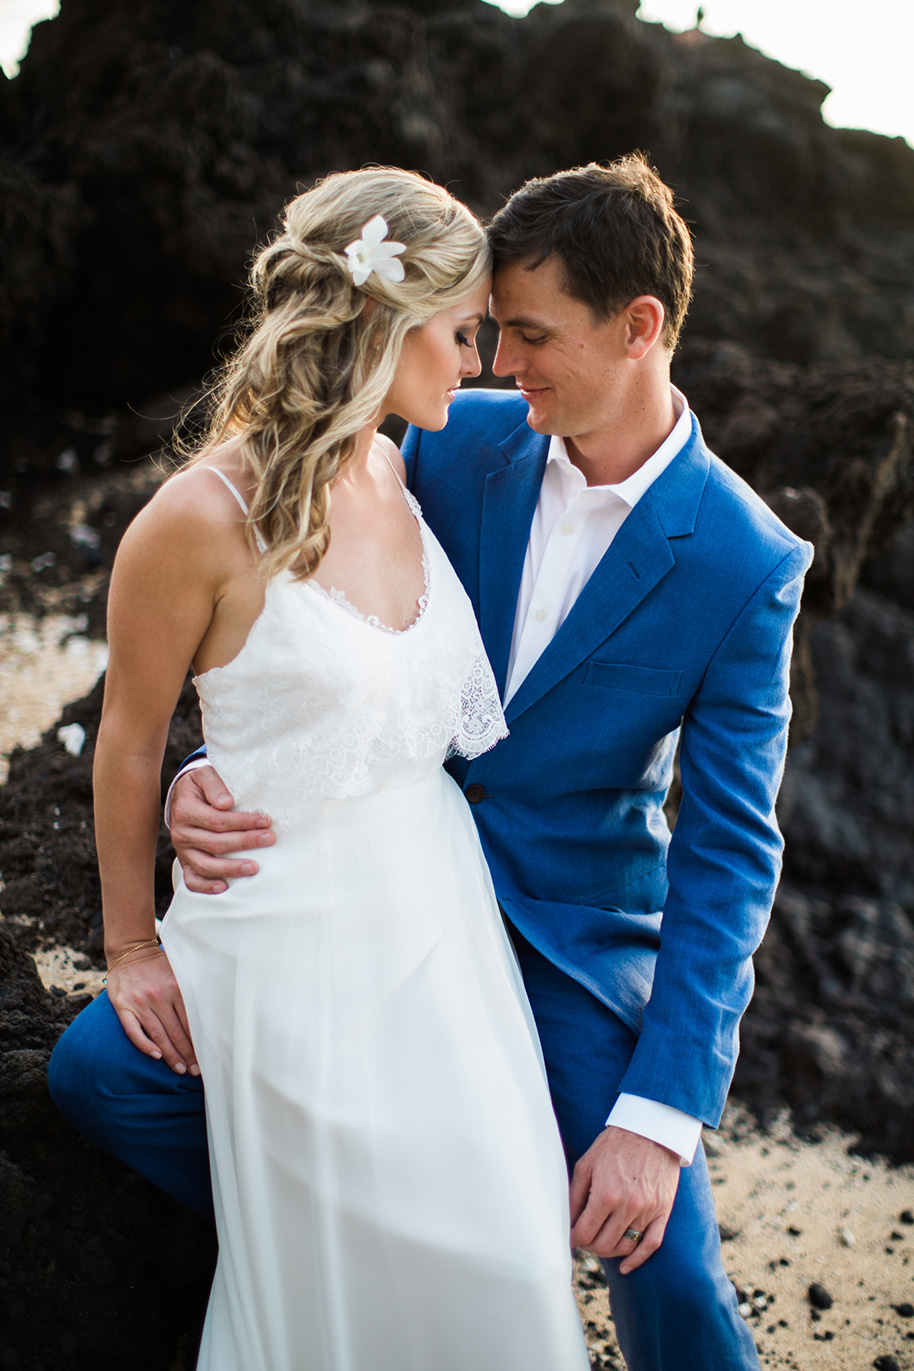 Maui-Wedding-060216-17